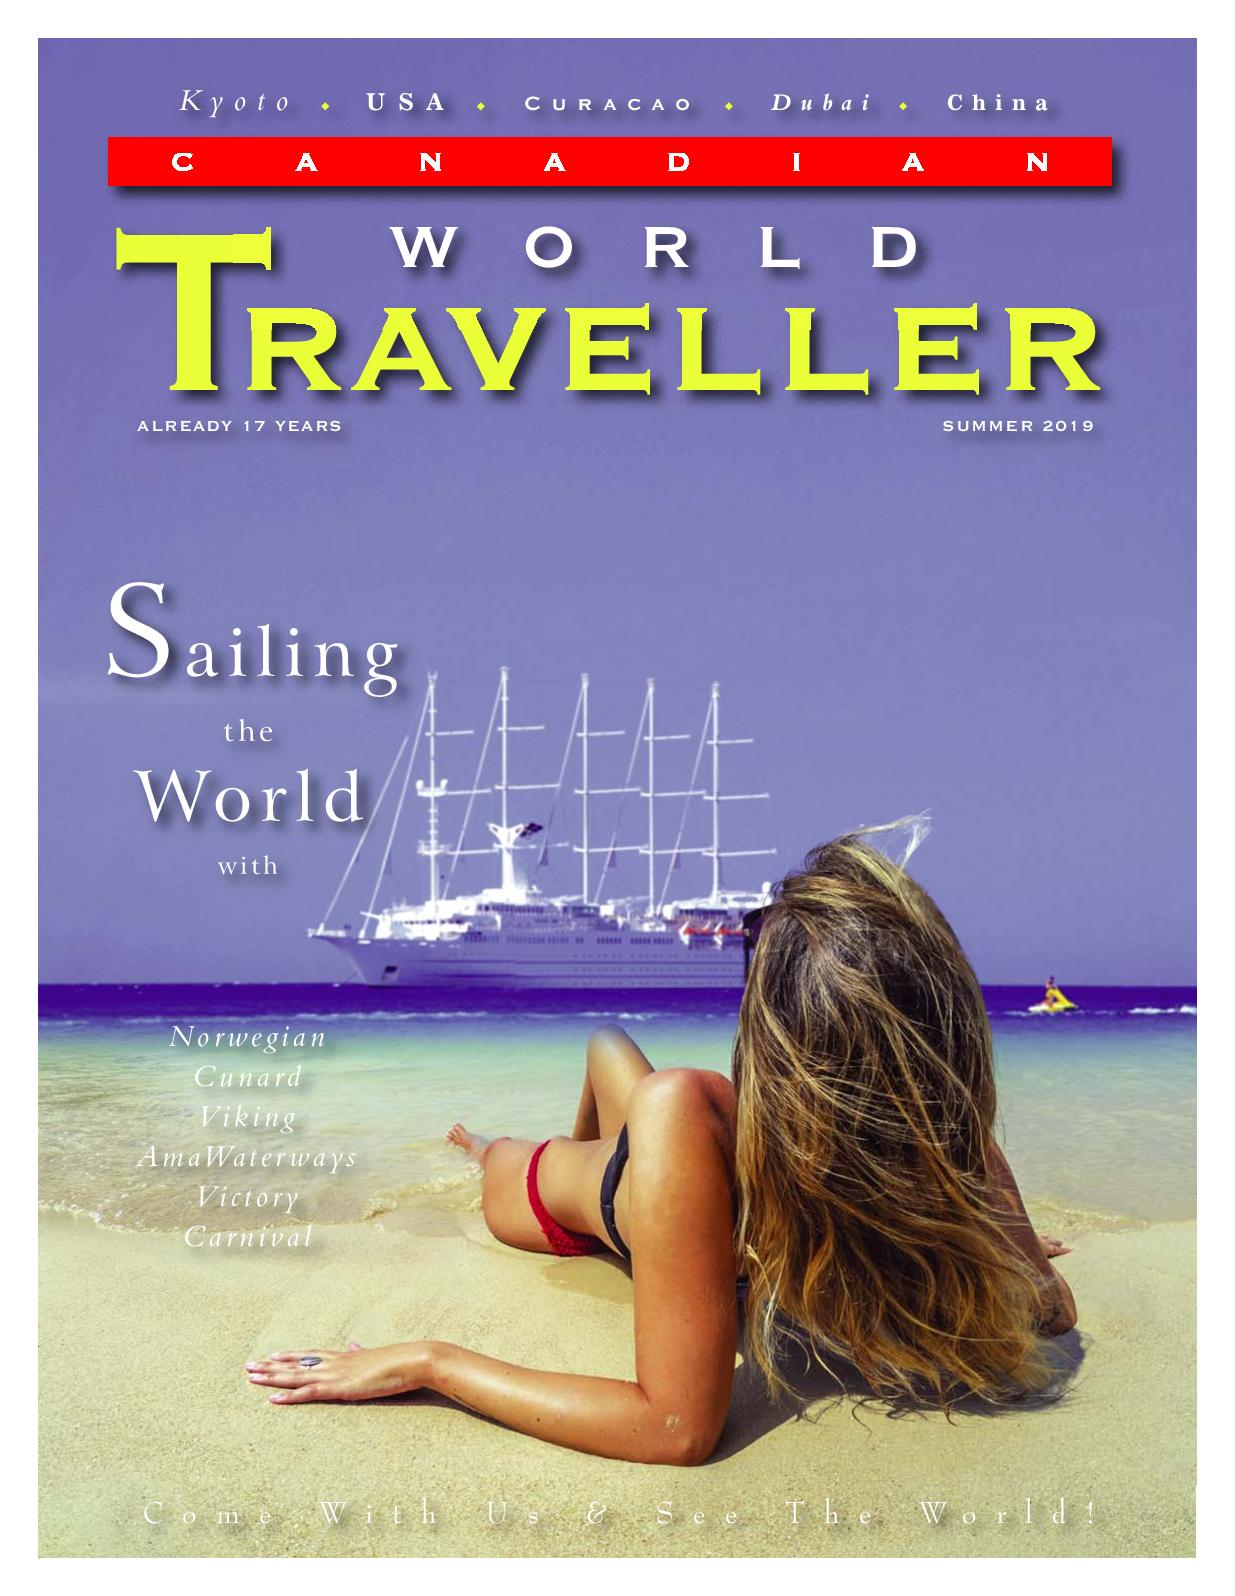 Calaméo - Canadian World Traveller Summer 2019 Issue